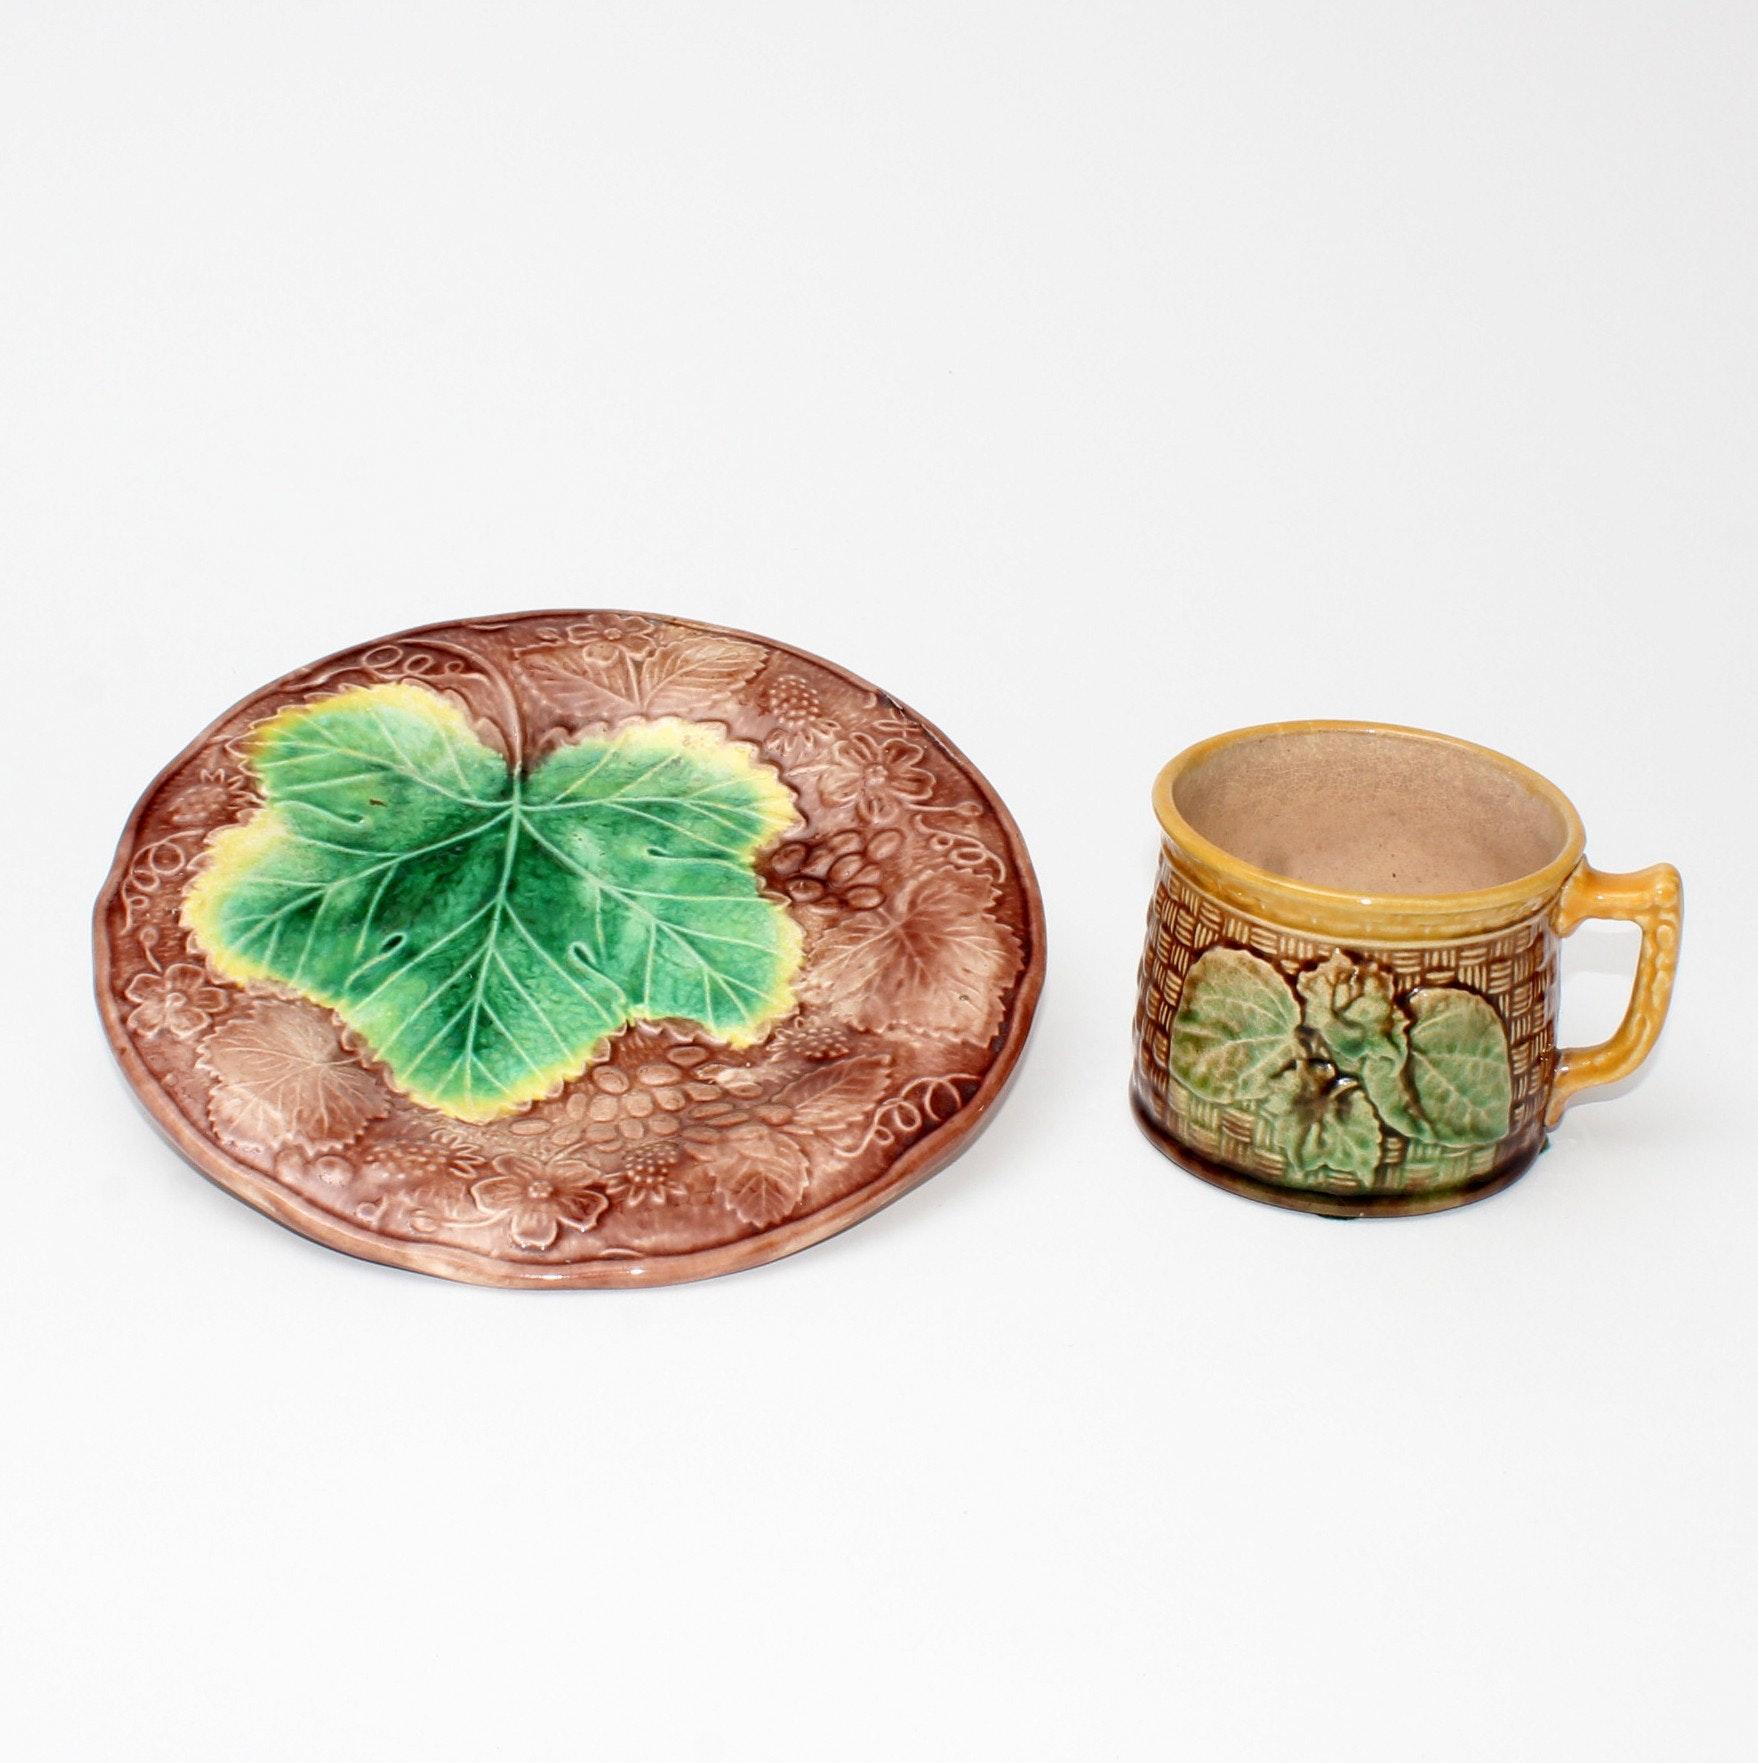 Antique Majolica Grapeleaf Plate and Cherry Blossom Cup